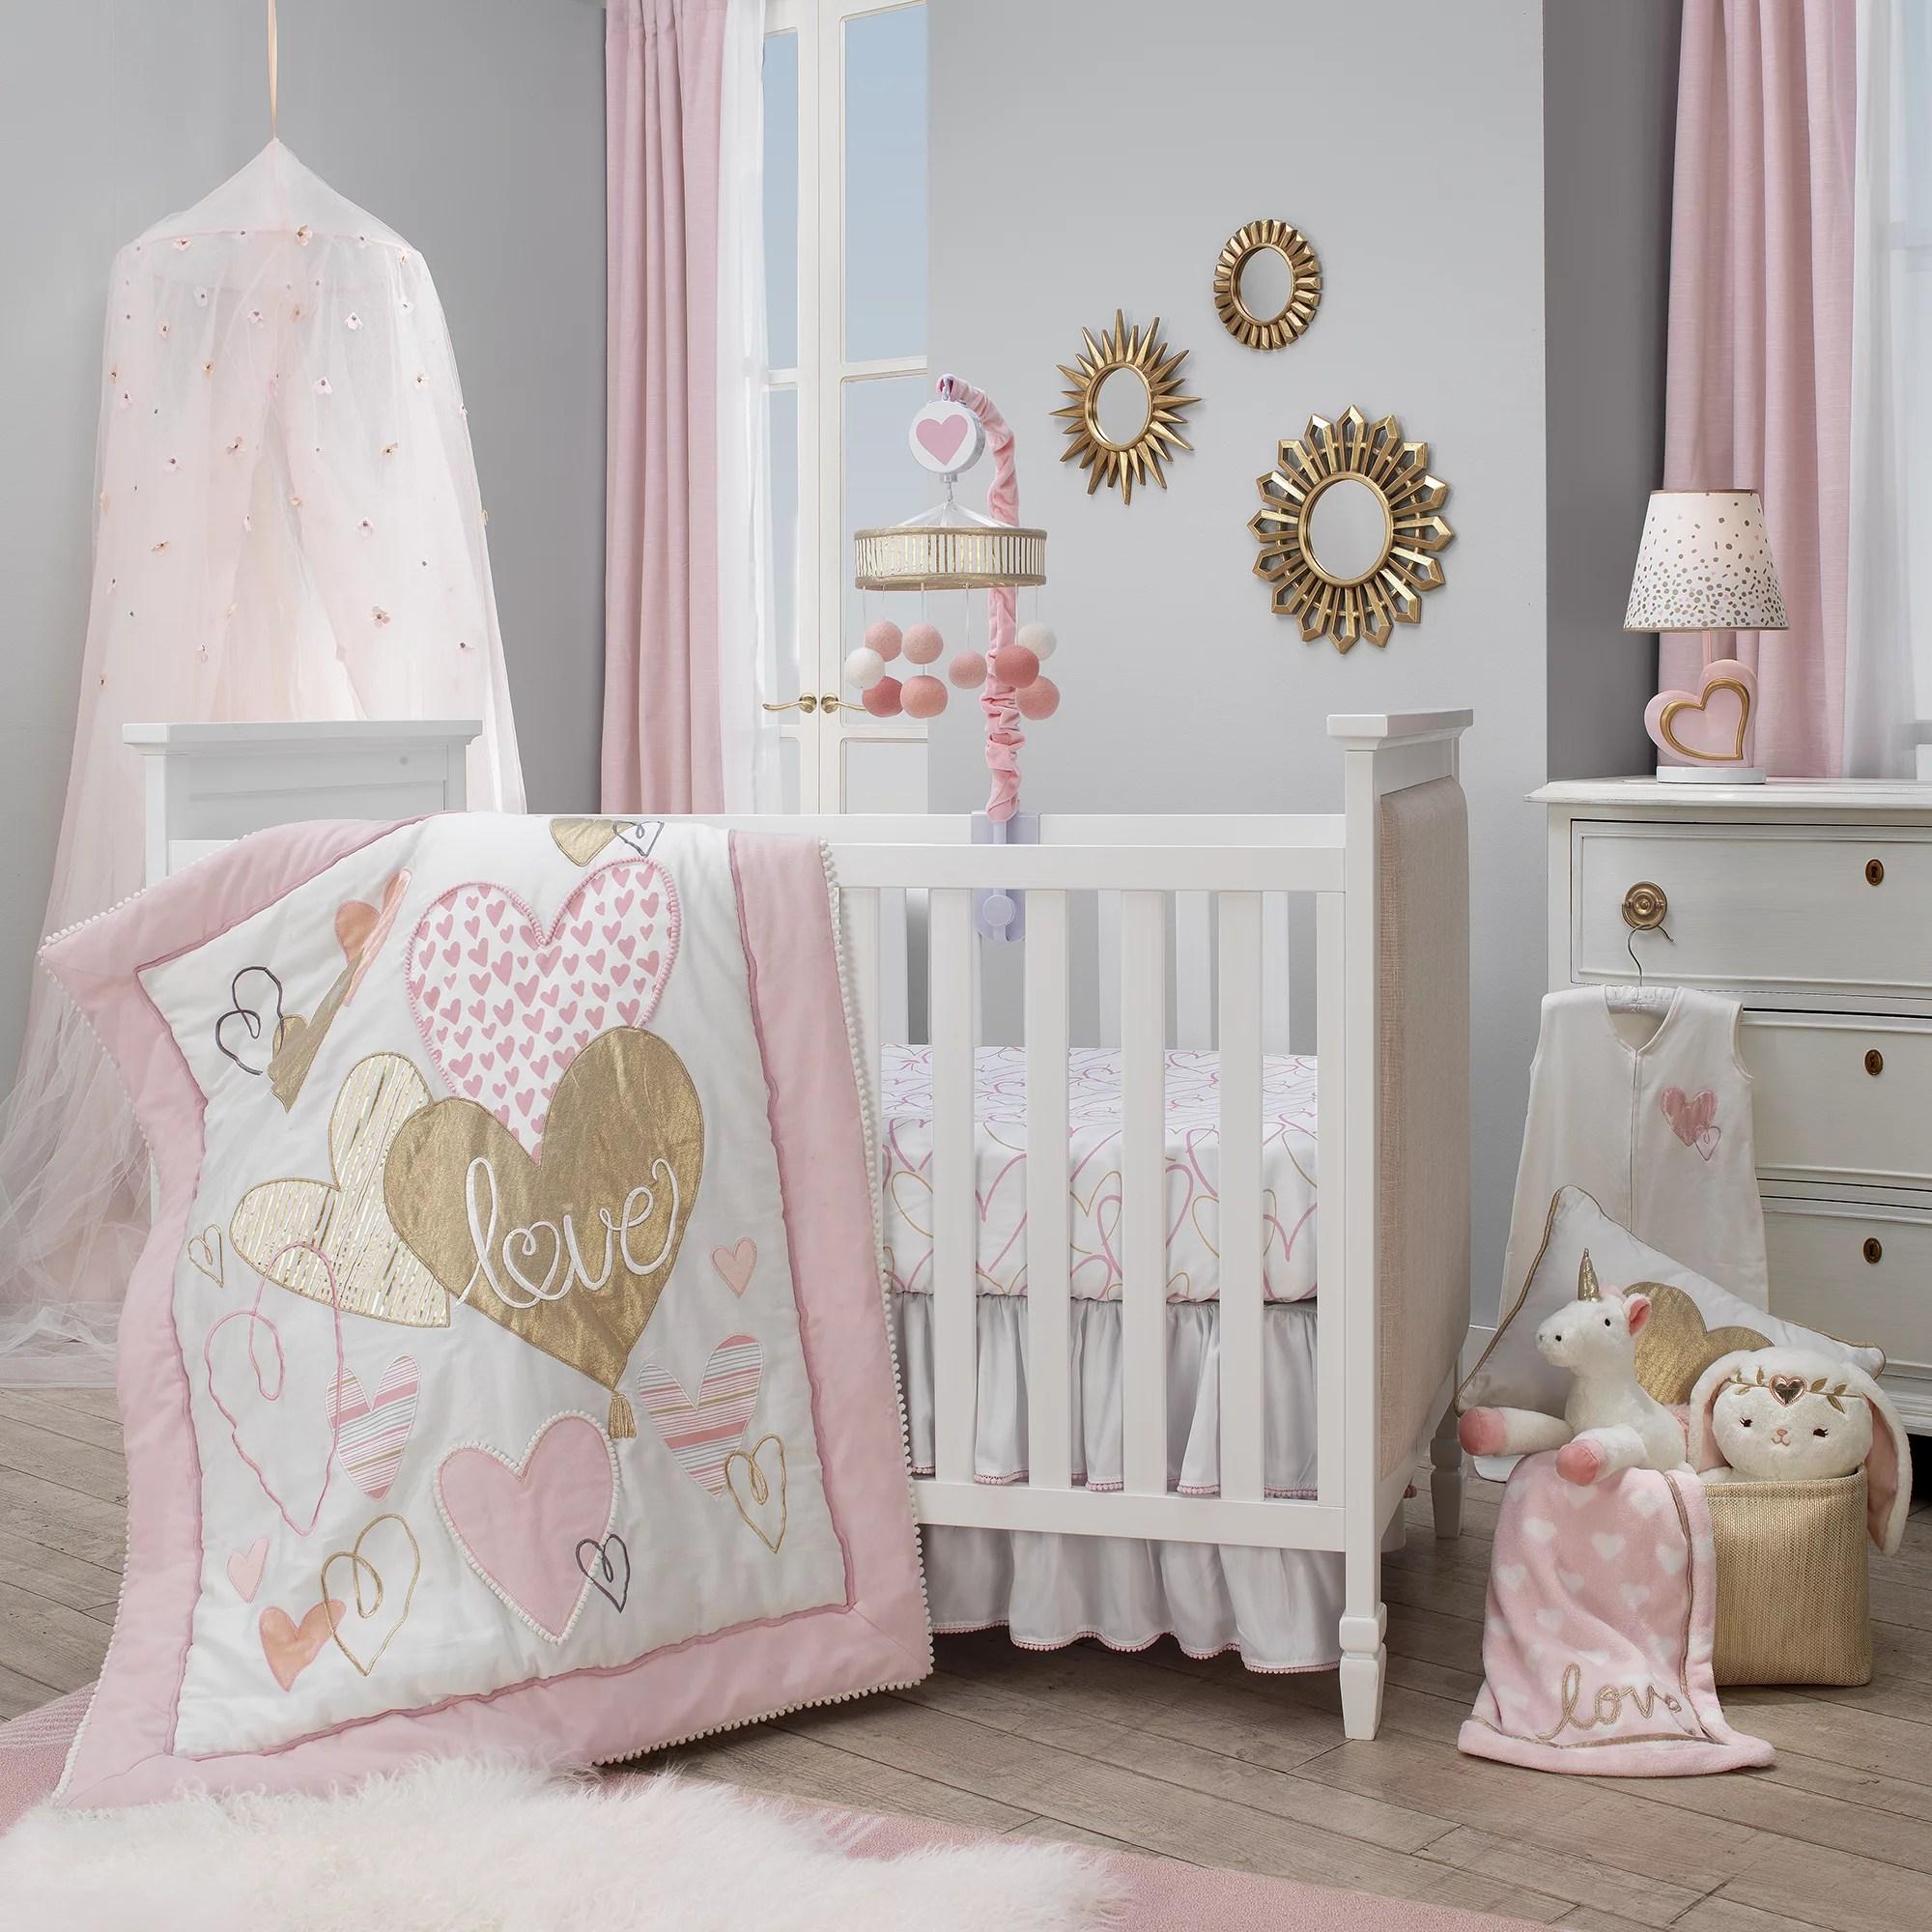 lambs ivy layla pink gold hearts love 4 piece nursery baby crib bedding set